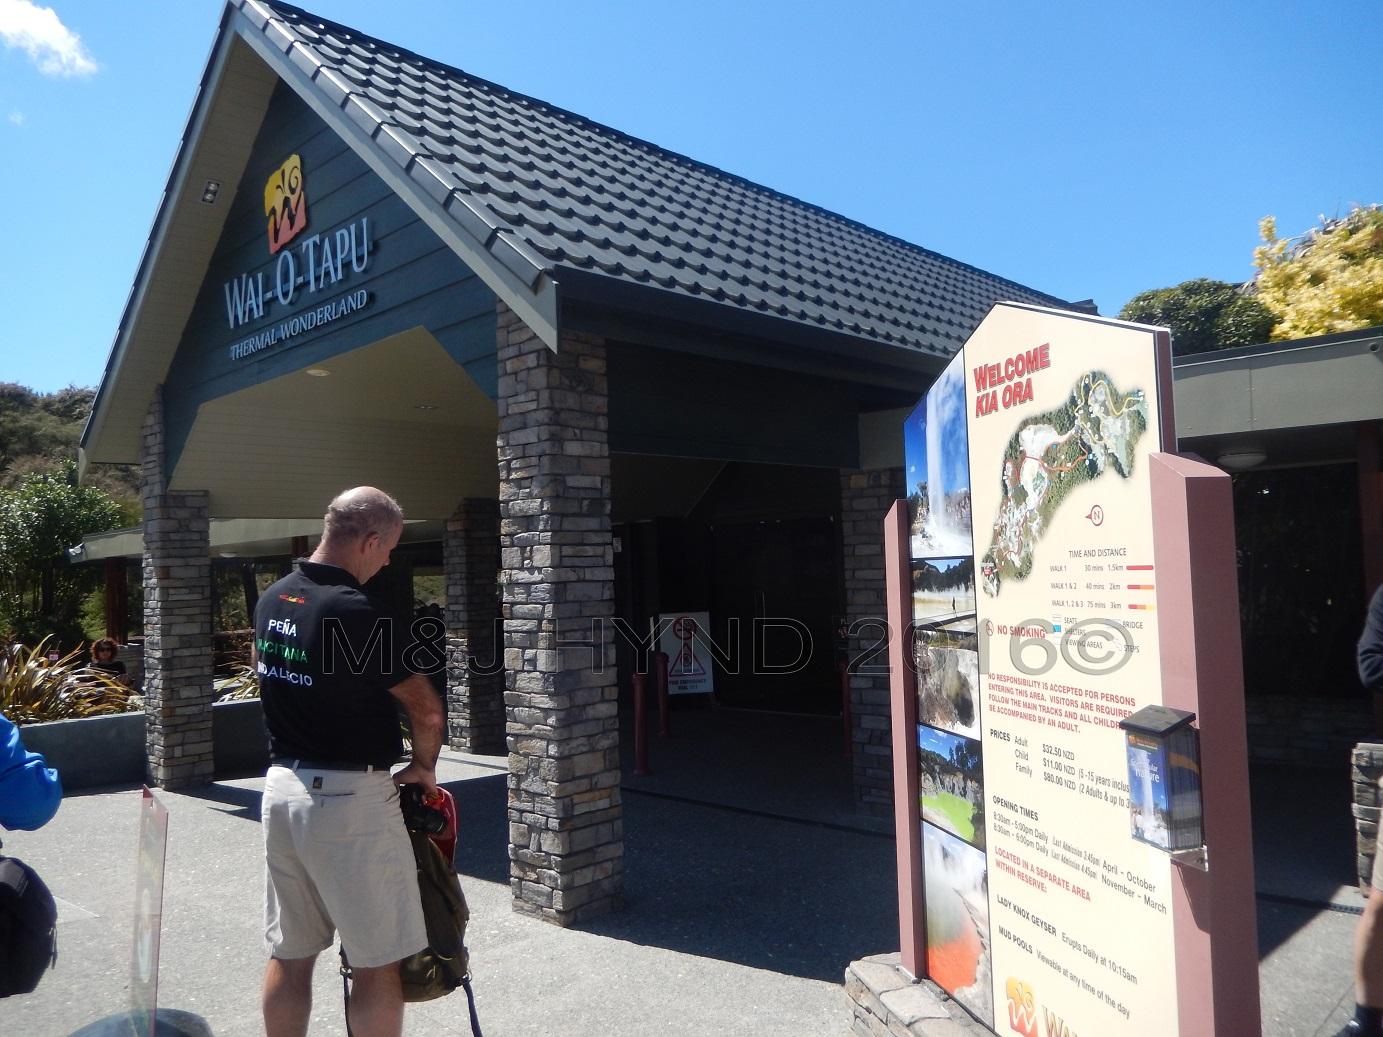 Wai-o-tapu Thermal Wonderland entrance, Rotorua, NZ